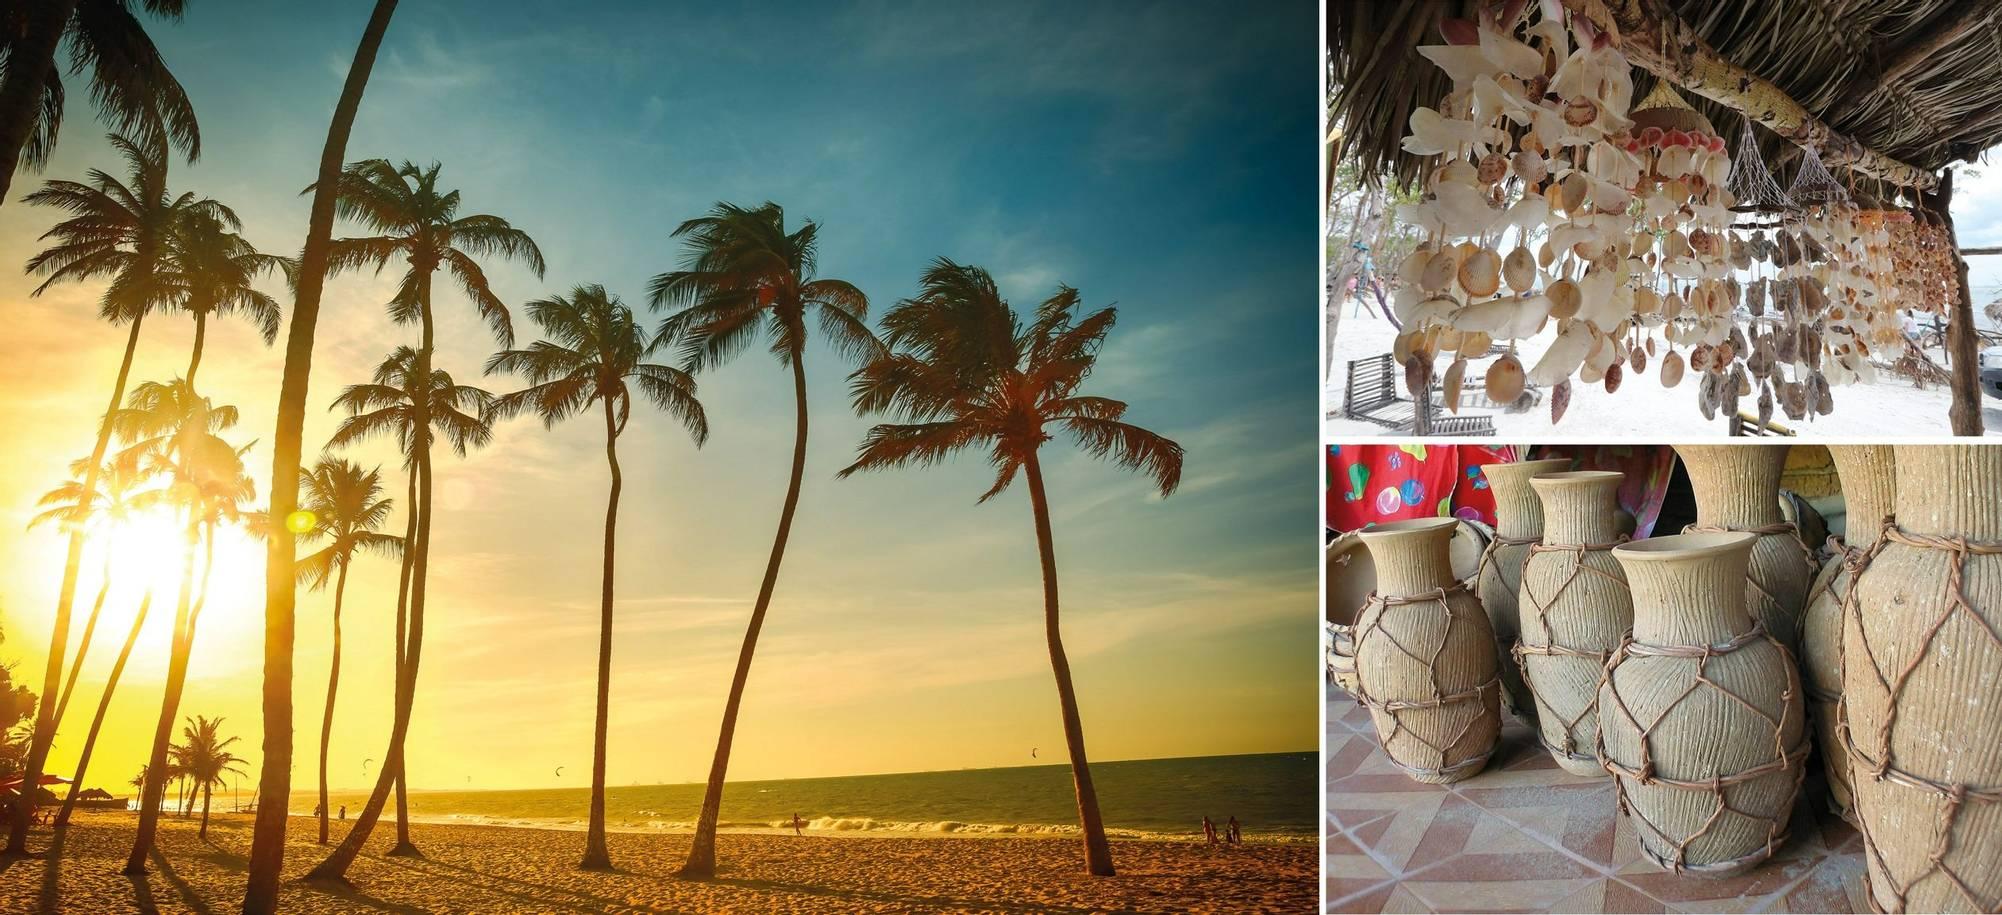 DesktopImages_Iguaza_Barbados_10.jpg